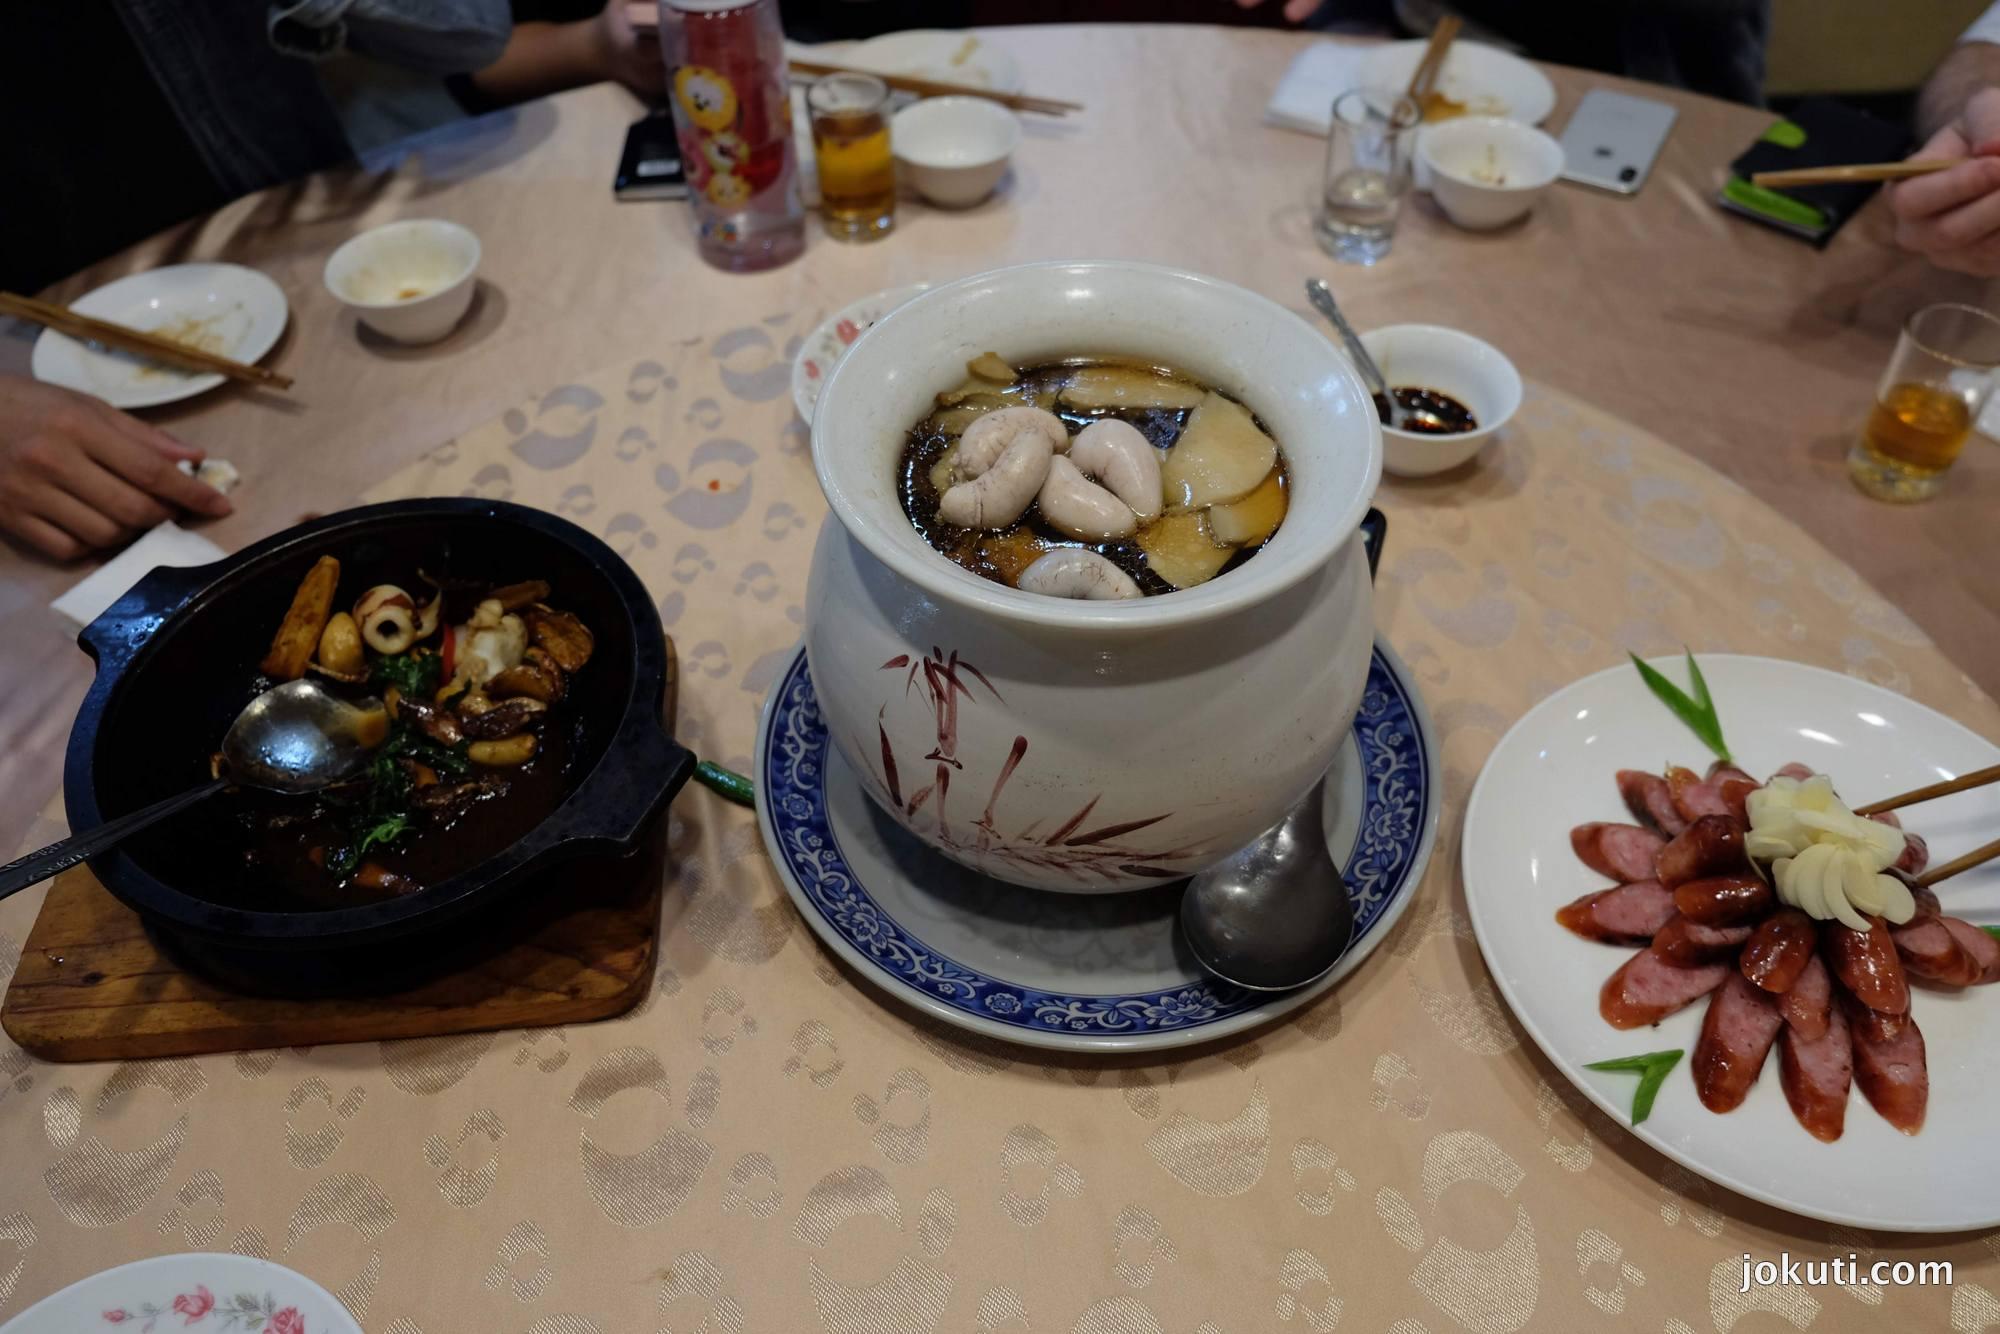 dscf2945_taipei_ming_fu_seafood_michelin_taiwan_vilagevo_jokuti.jpg